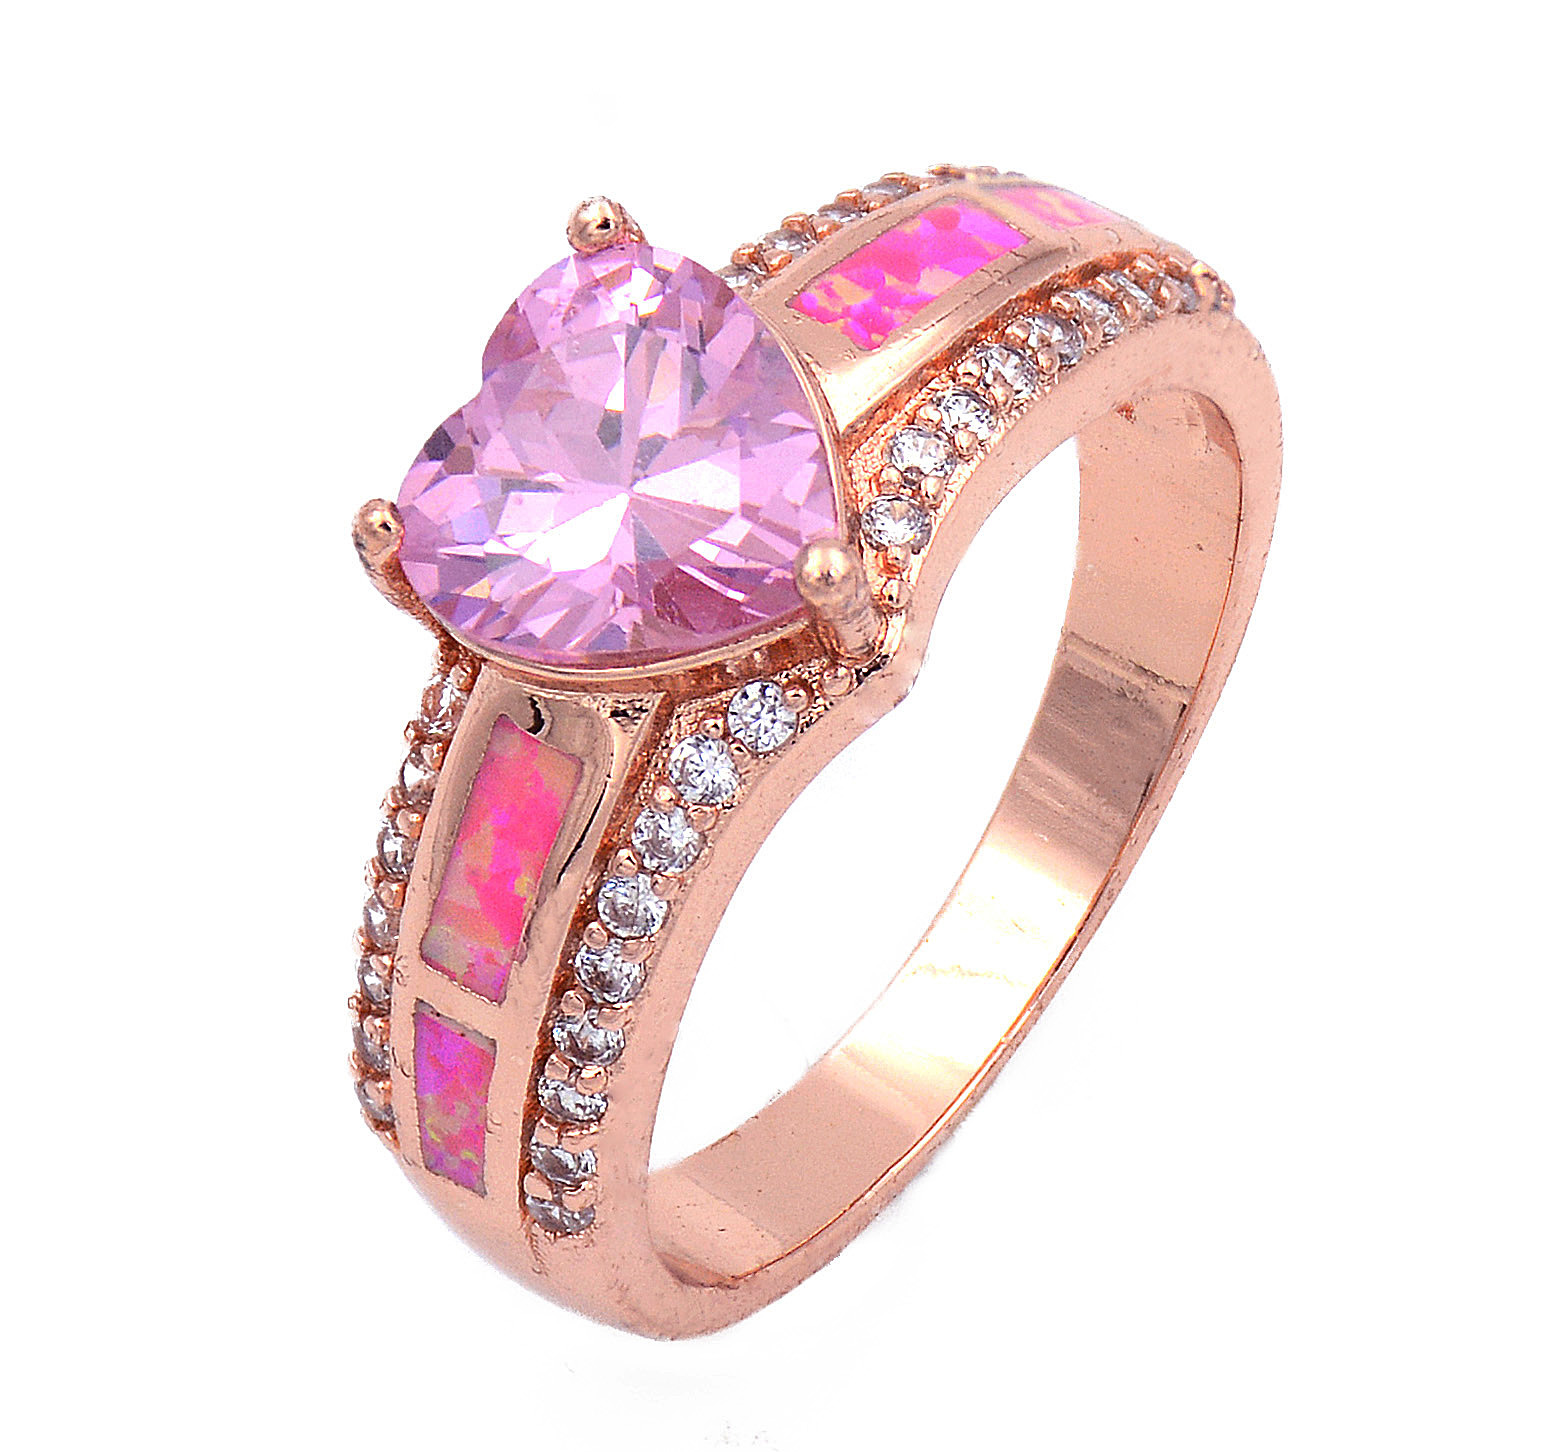 Elegant Pink Diamond Rings for Women - Best Jewelry